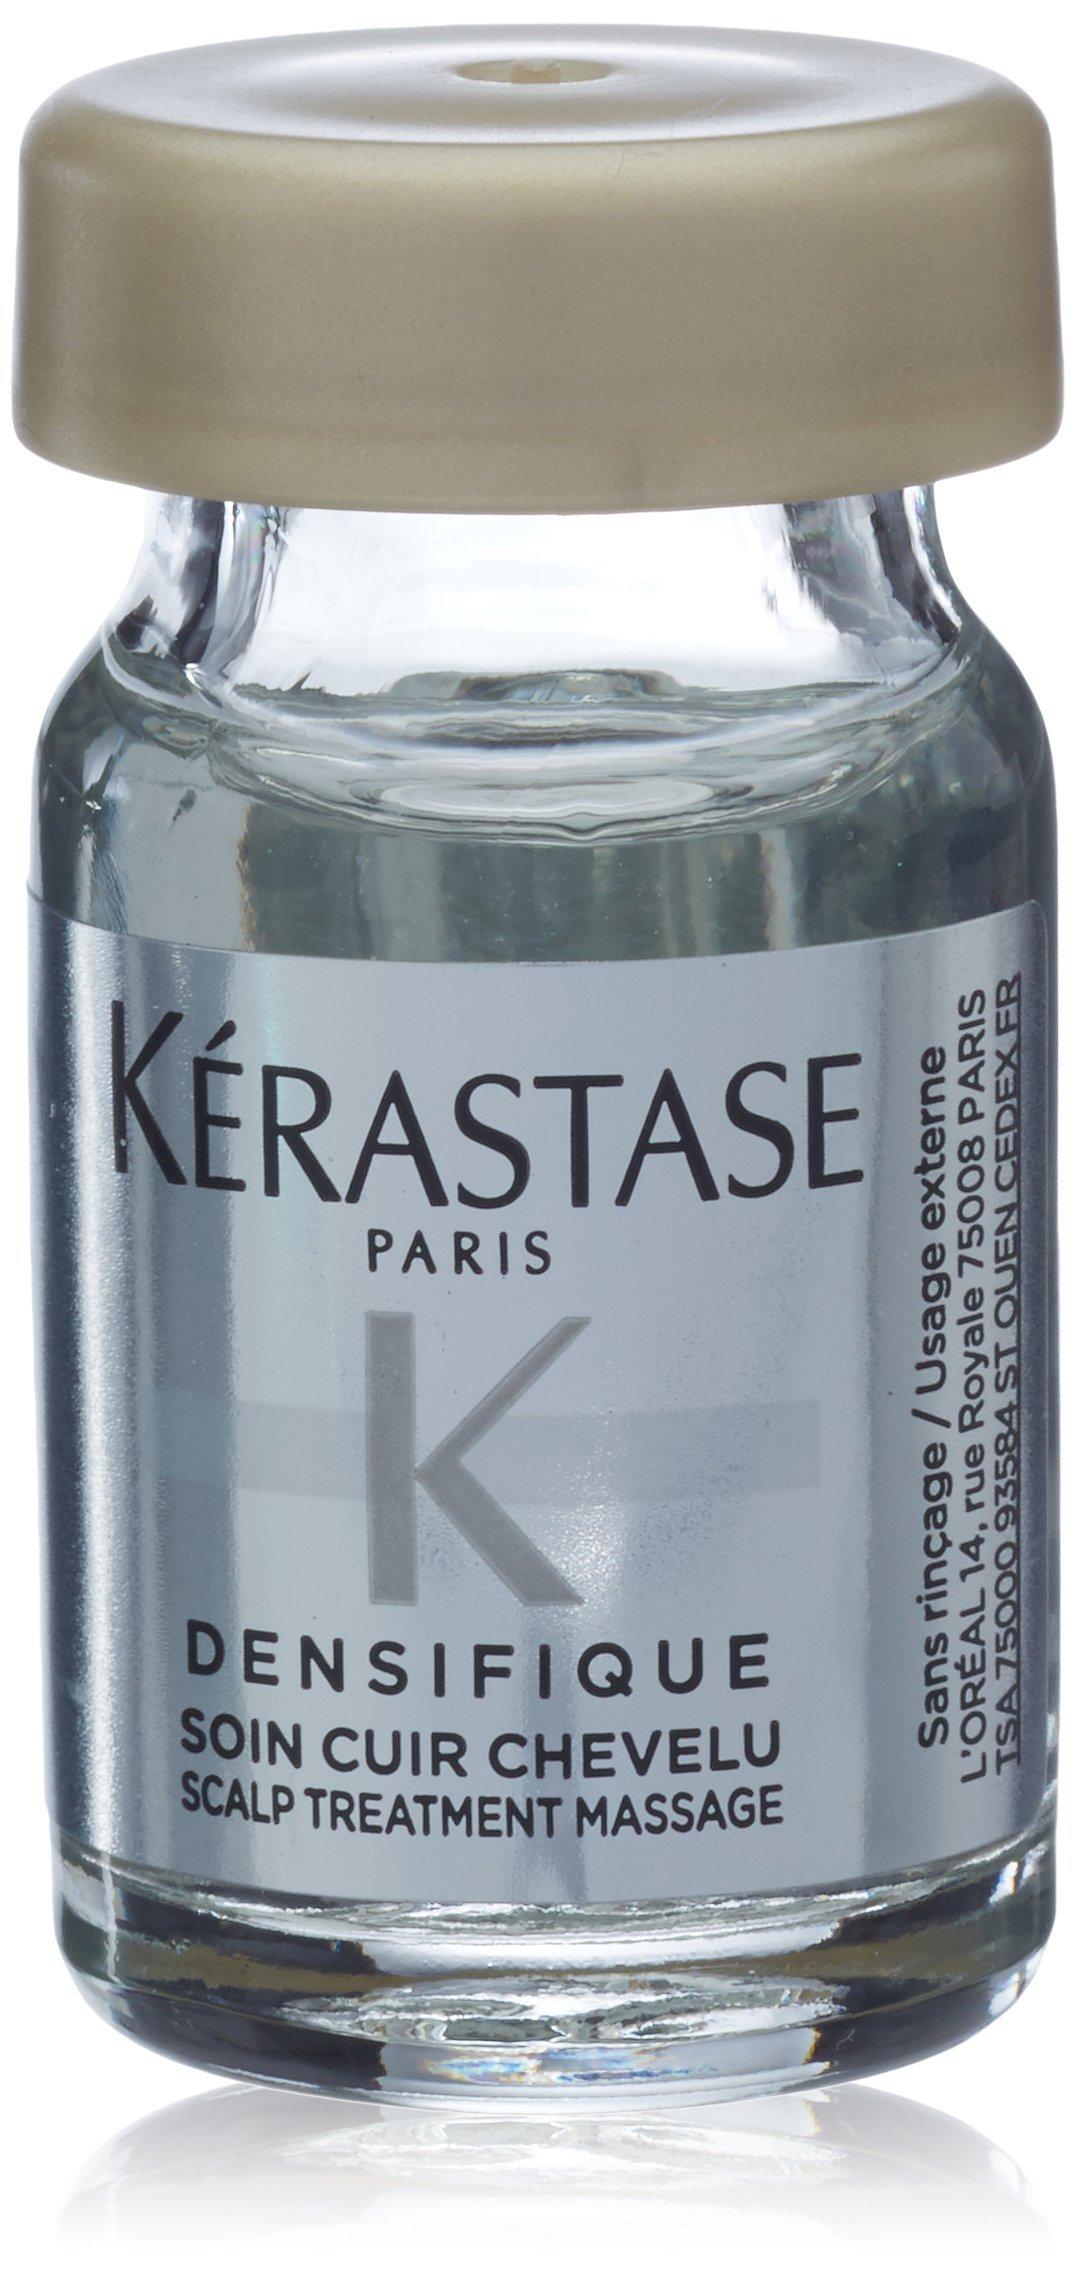 Kerastase Densifique Hair Density Quality & Fullness Activator Program, 30 Count